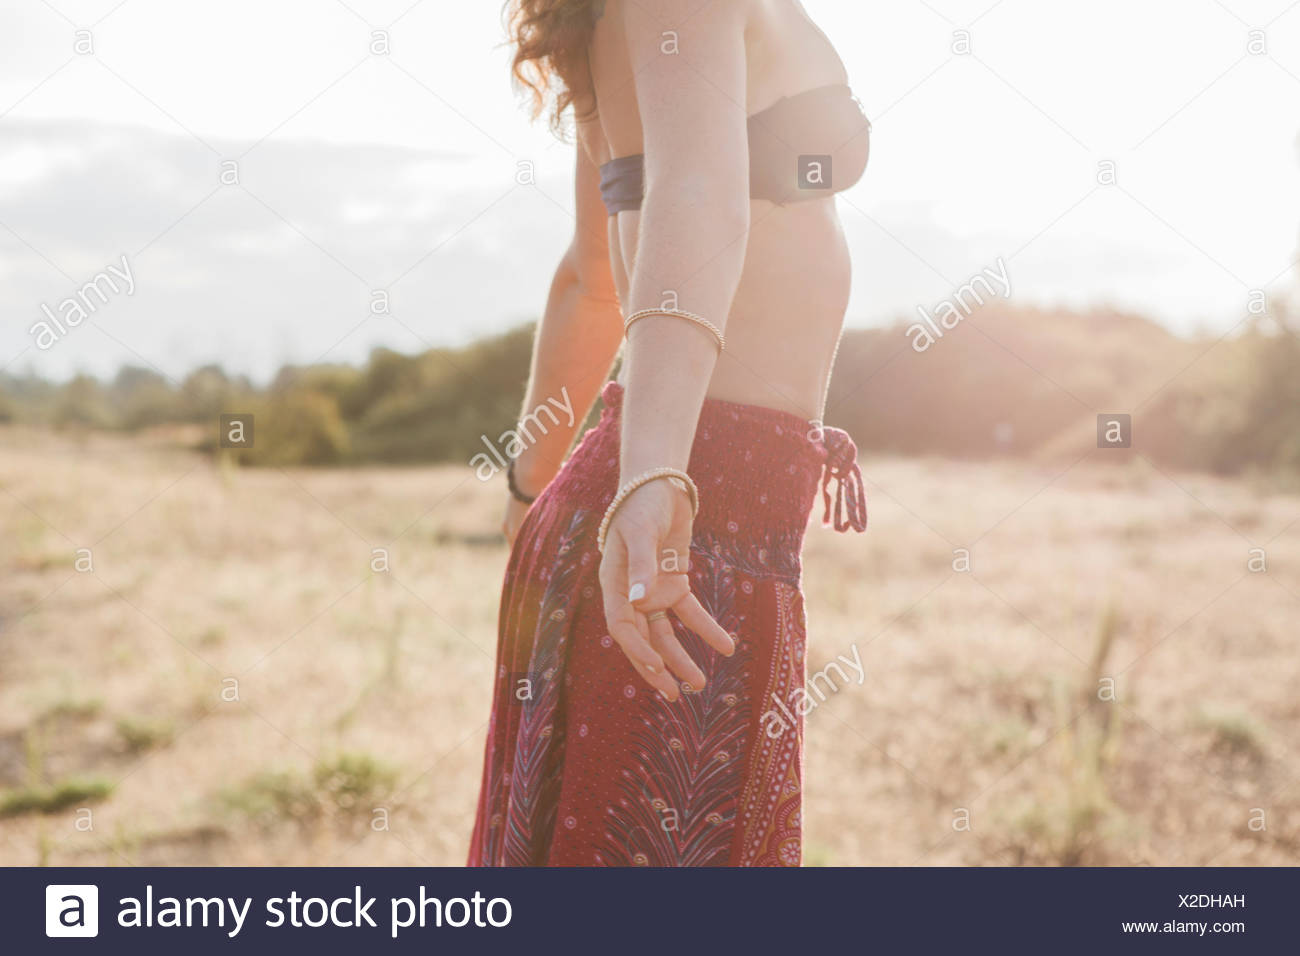 Boho woman in bikini top et jupe avec bras tendus à sunny rural field Photo Stock